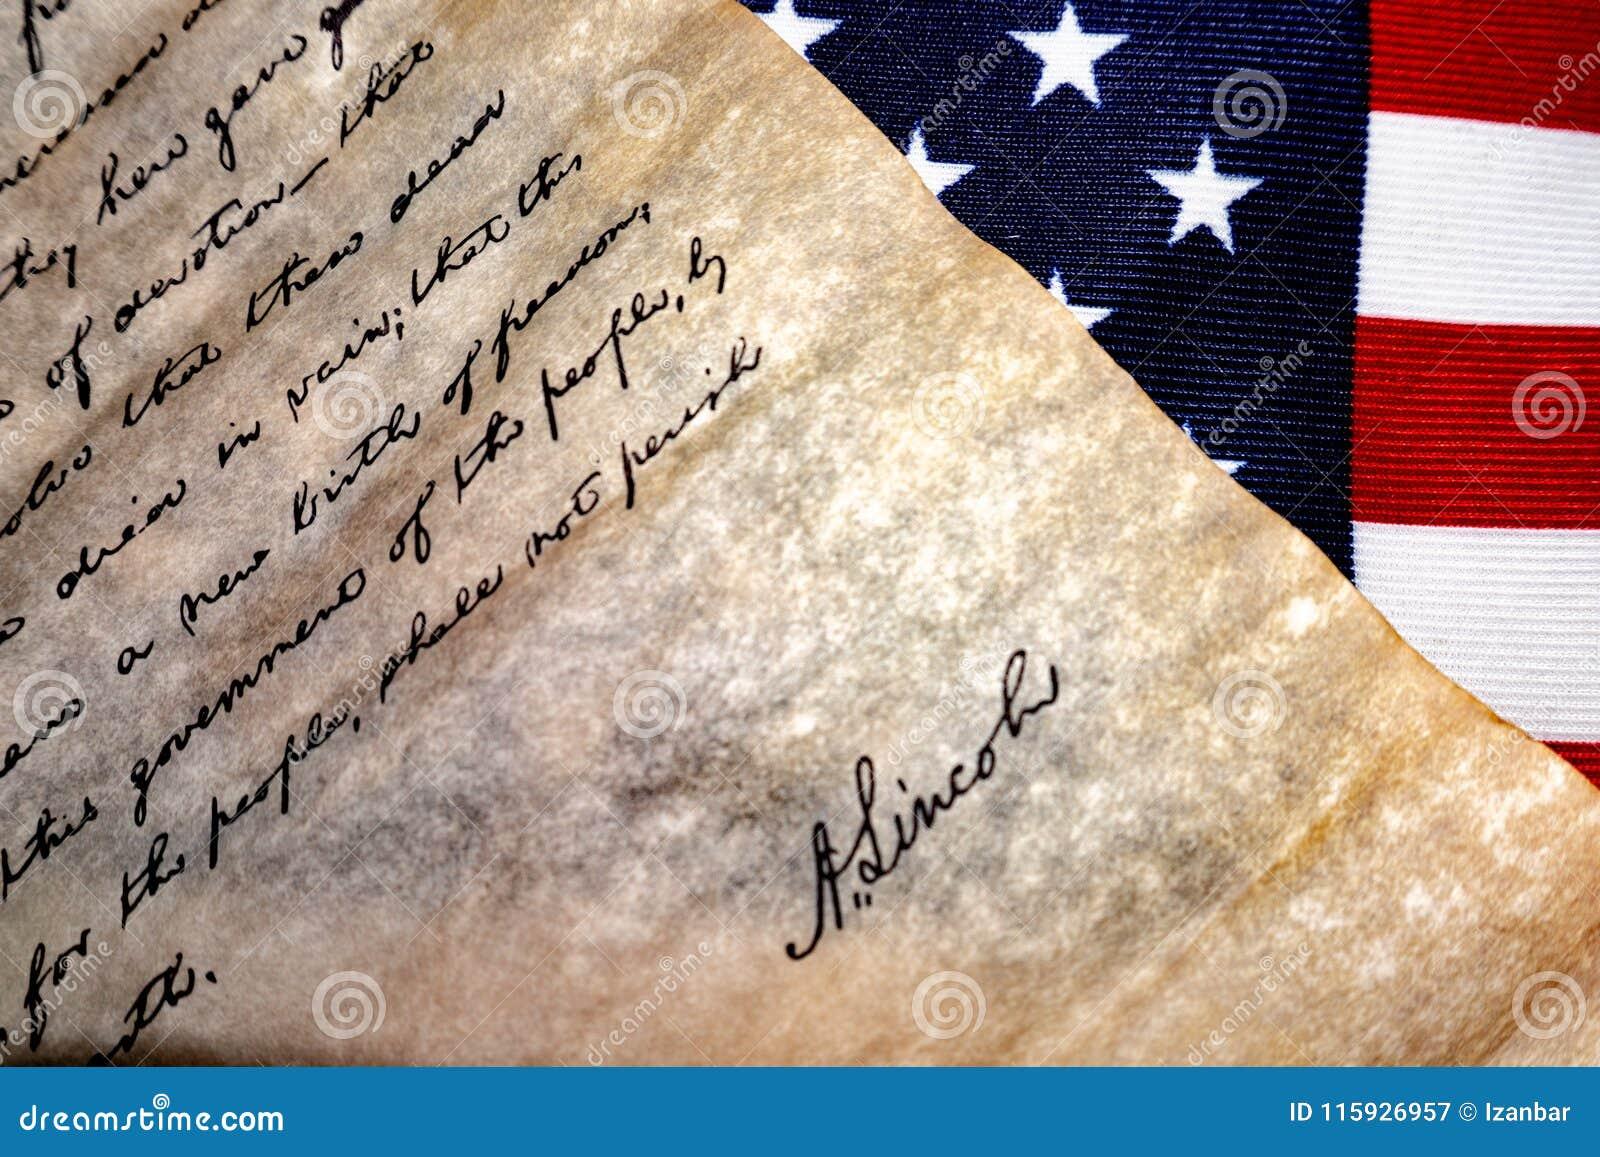 Gettysburg adressanförande vid U S Abraham Lincoln president